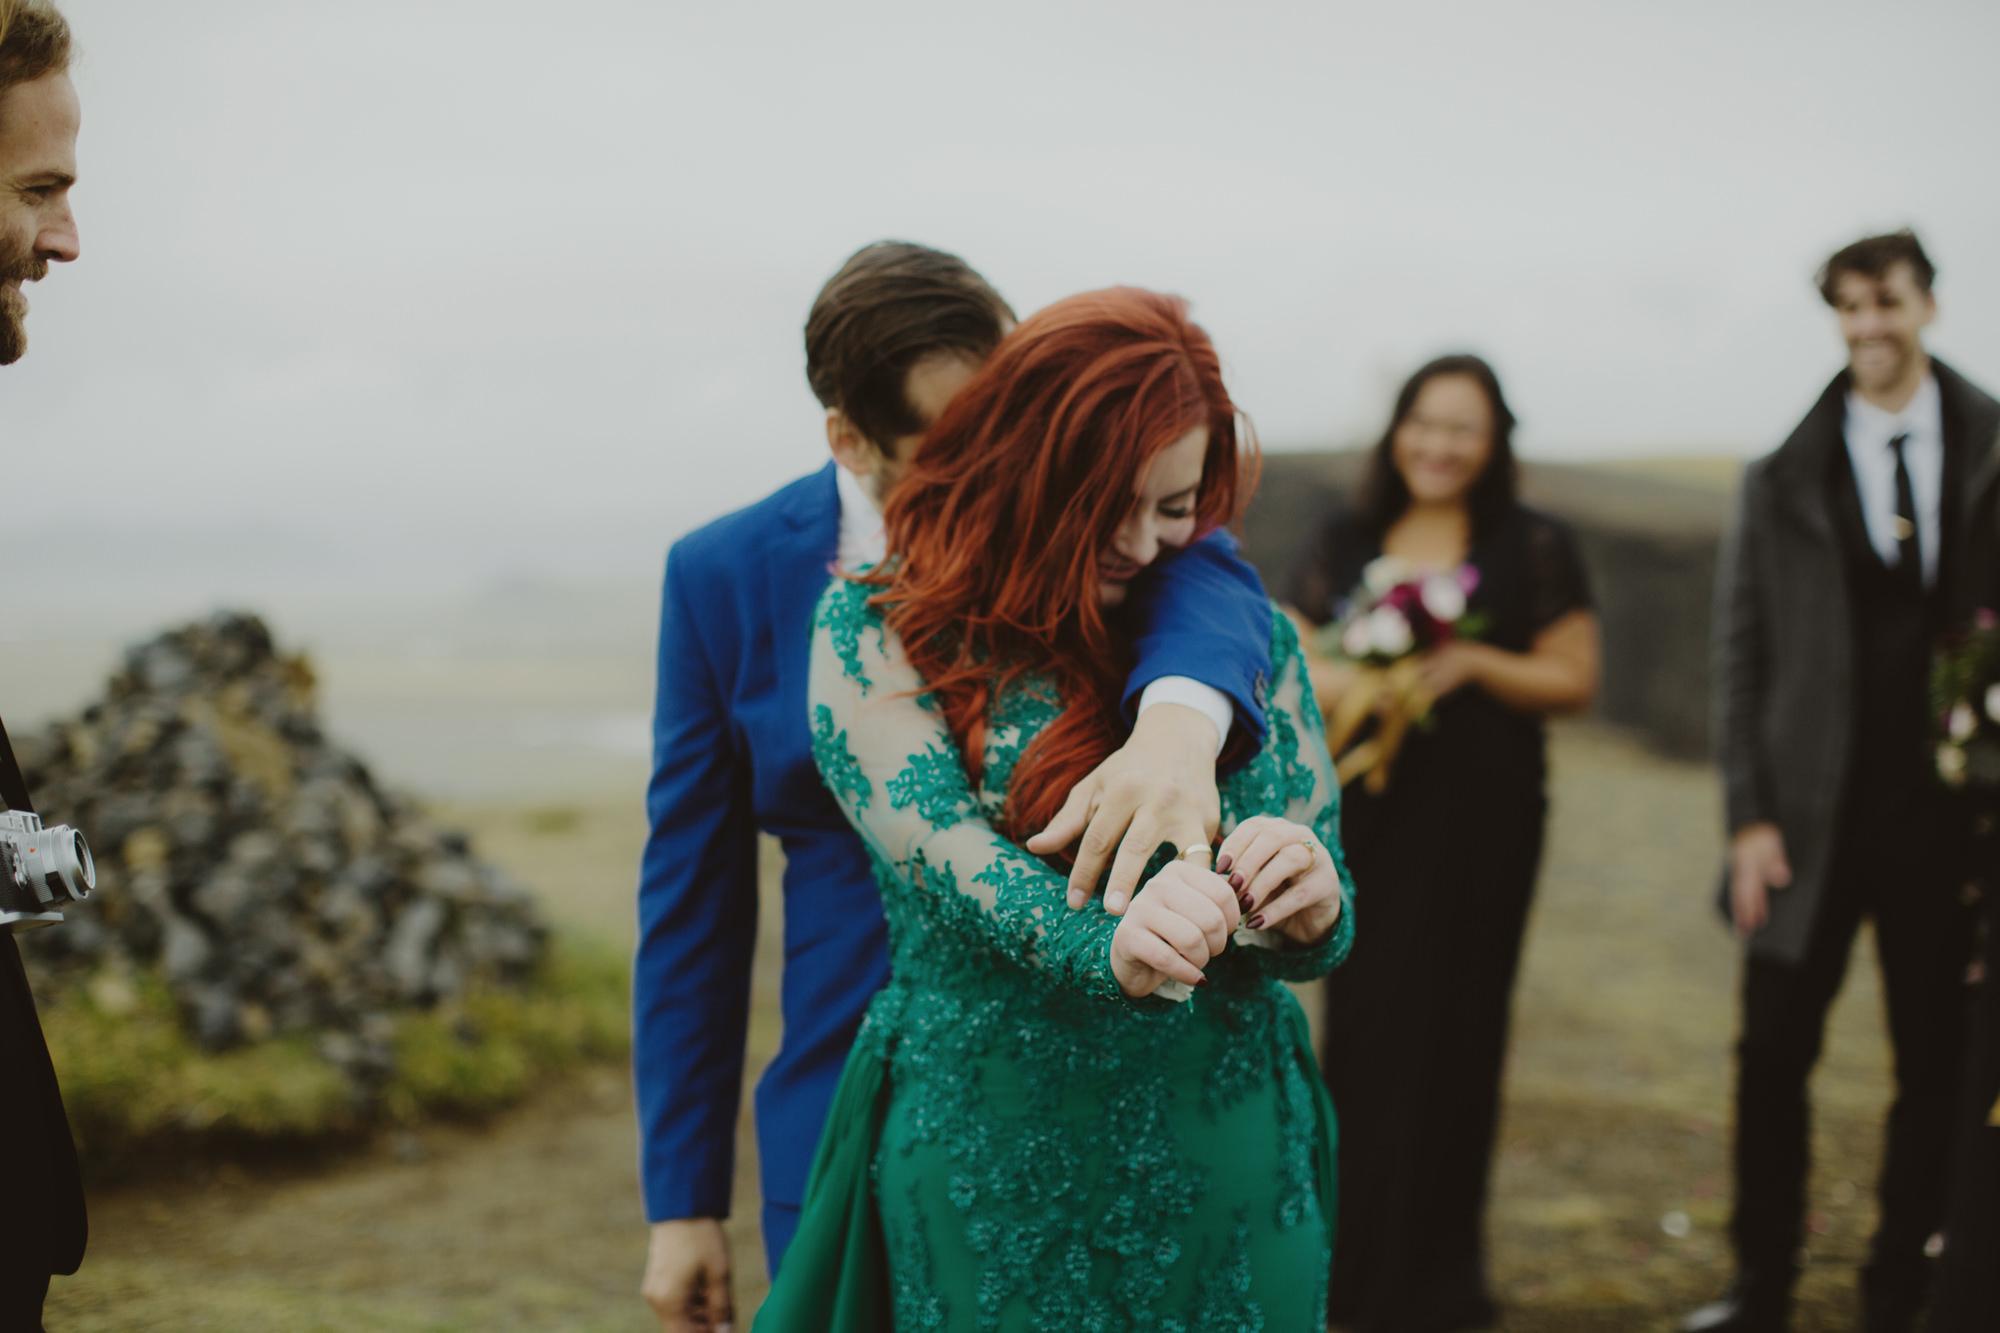 iceland_elopement_wedding_sammblake_047.jpg